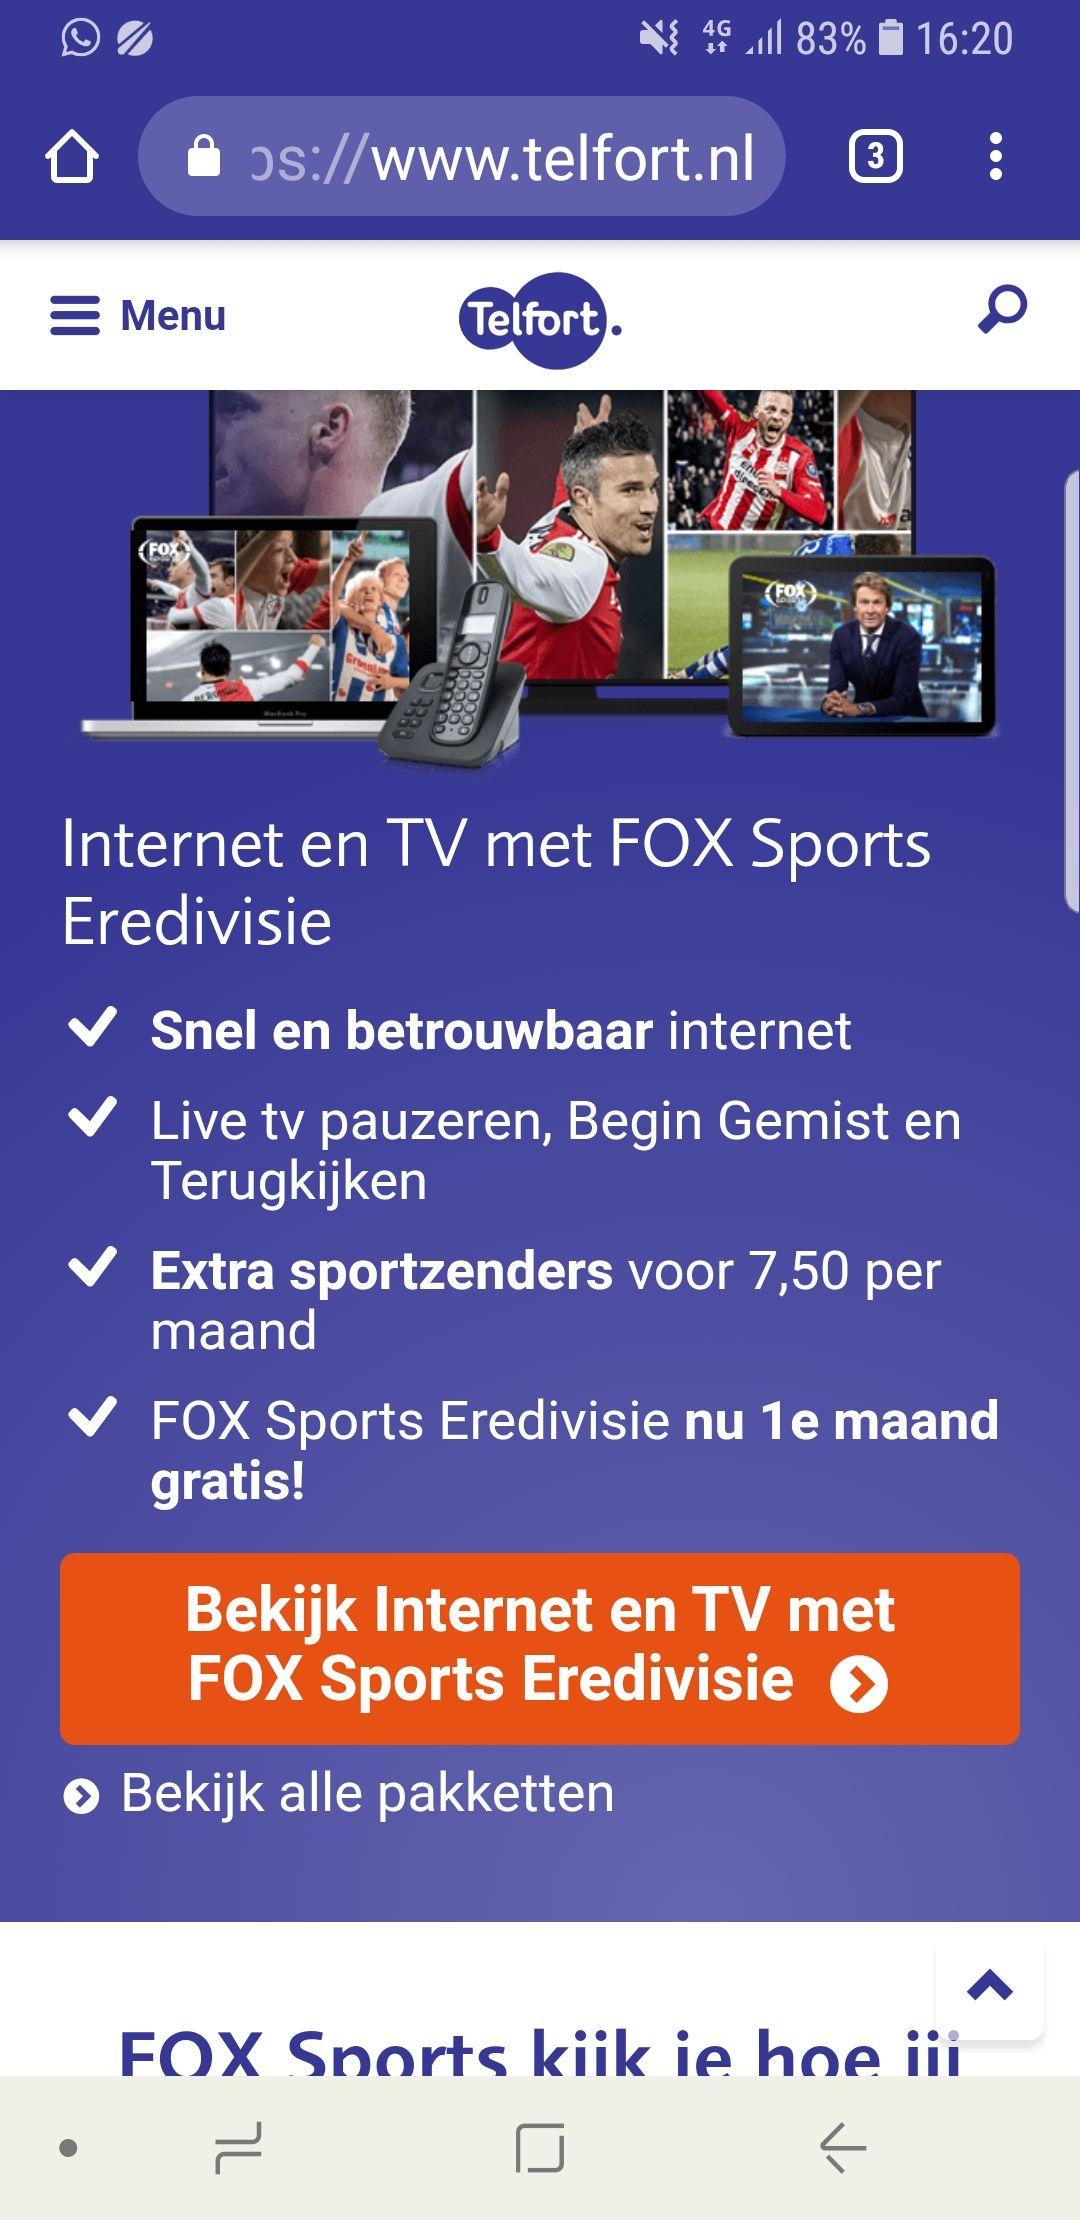 FOX Sports Eredivisienu 1e maand gratis